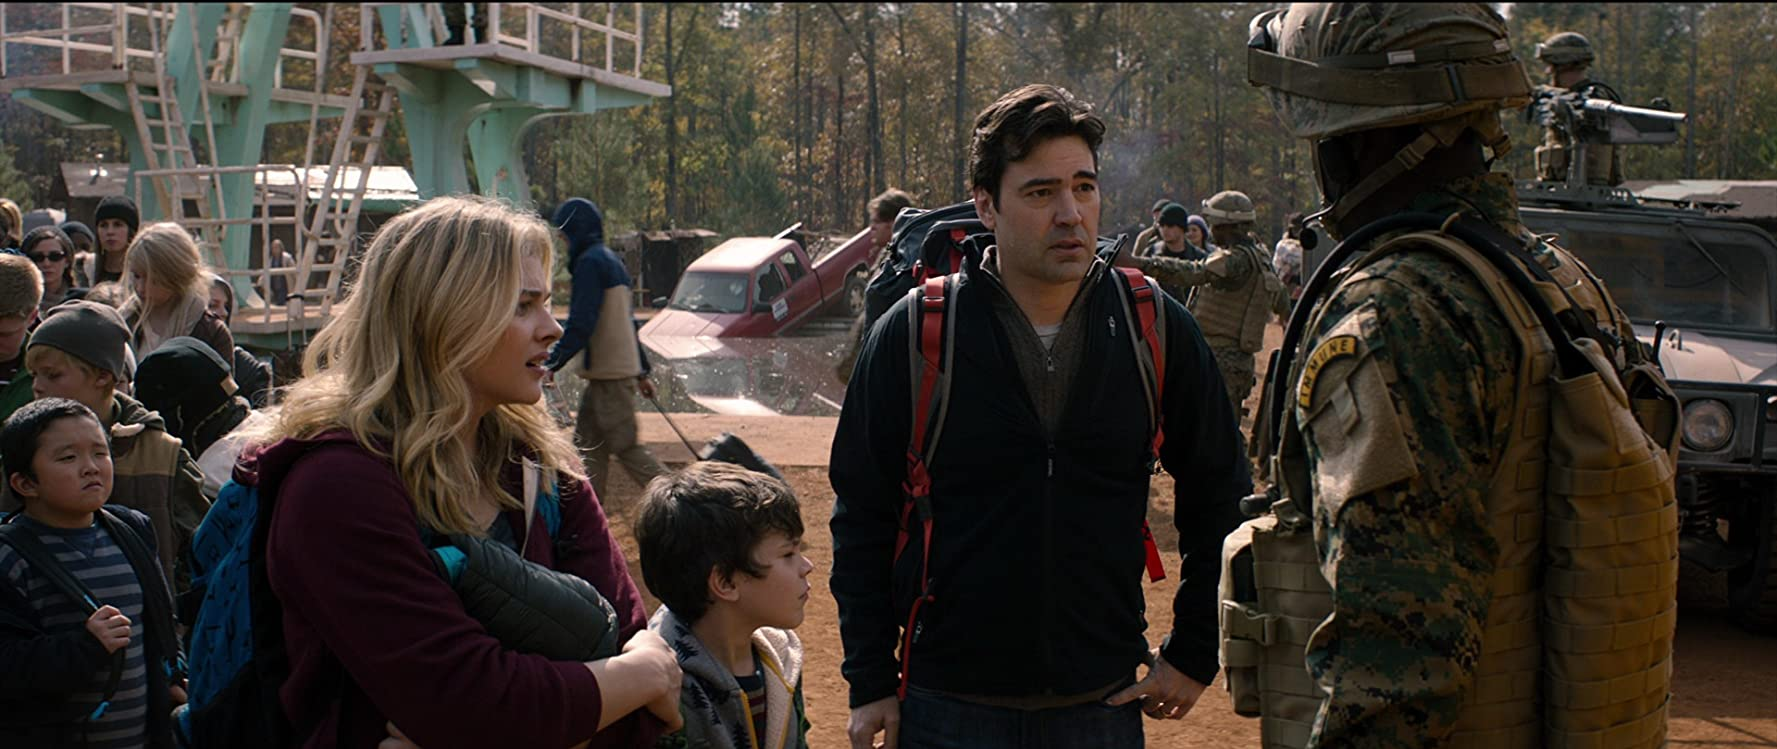 Ron Livingston, Chloë Grace Moretz, and Zackary Arthur in The 5th Wave (2016)